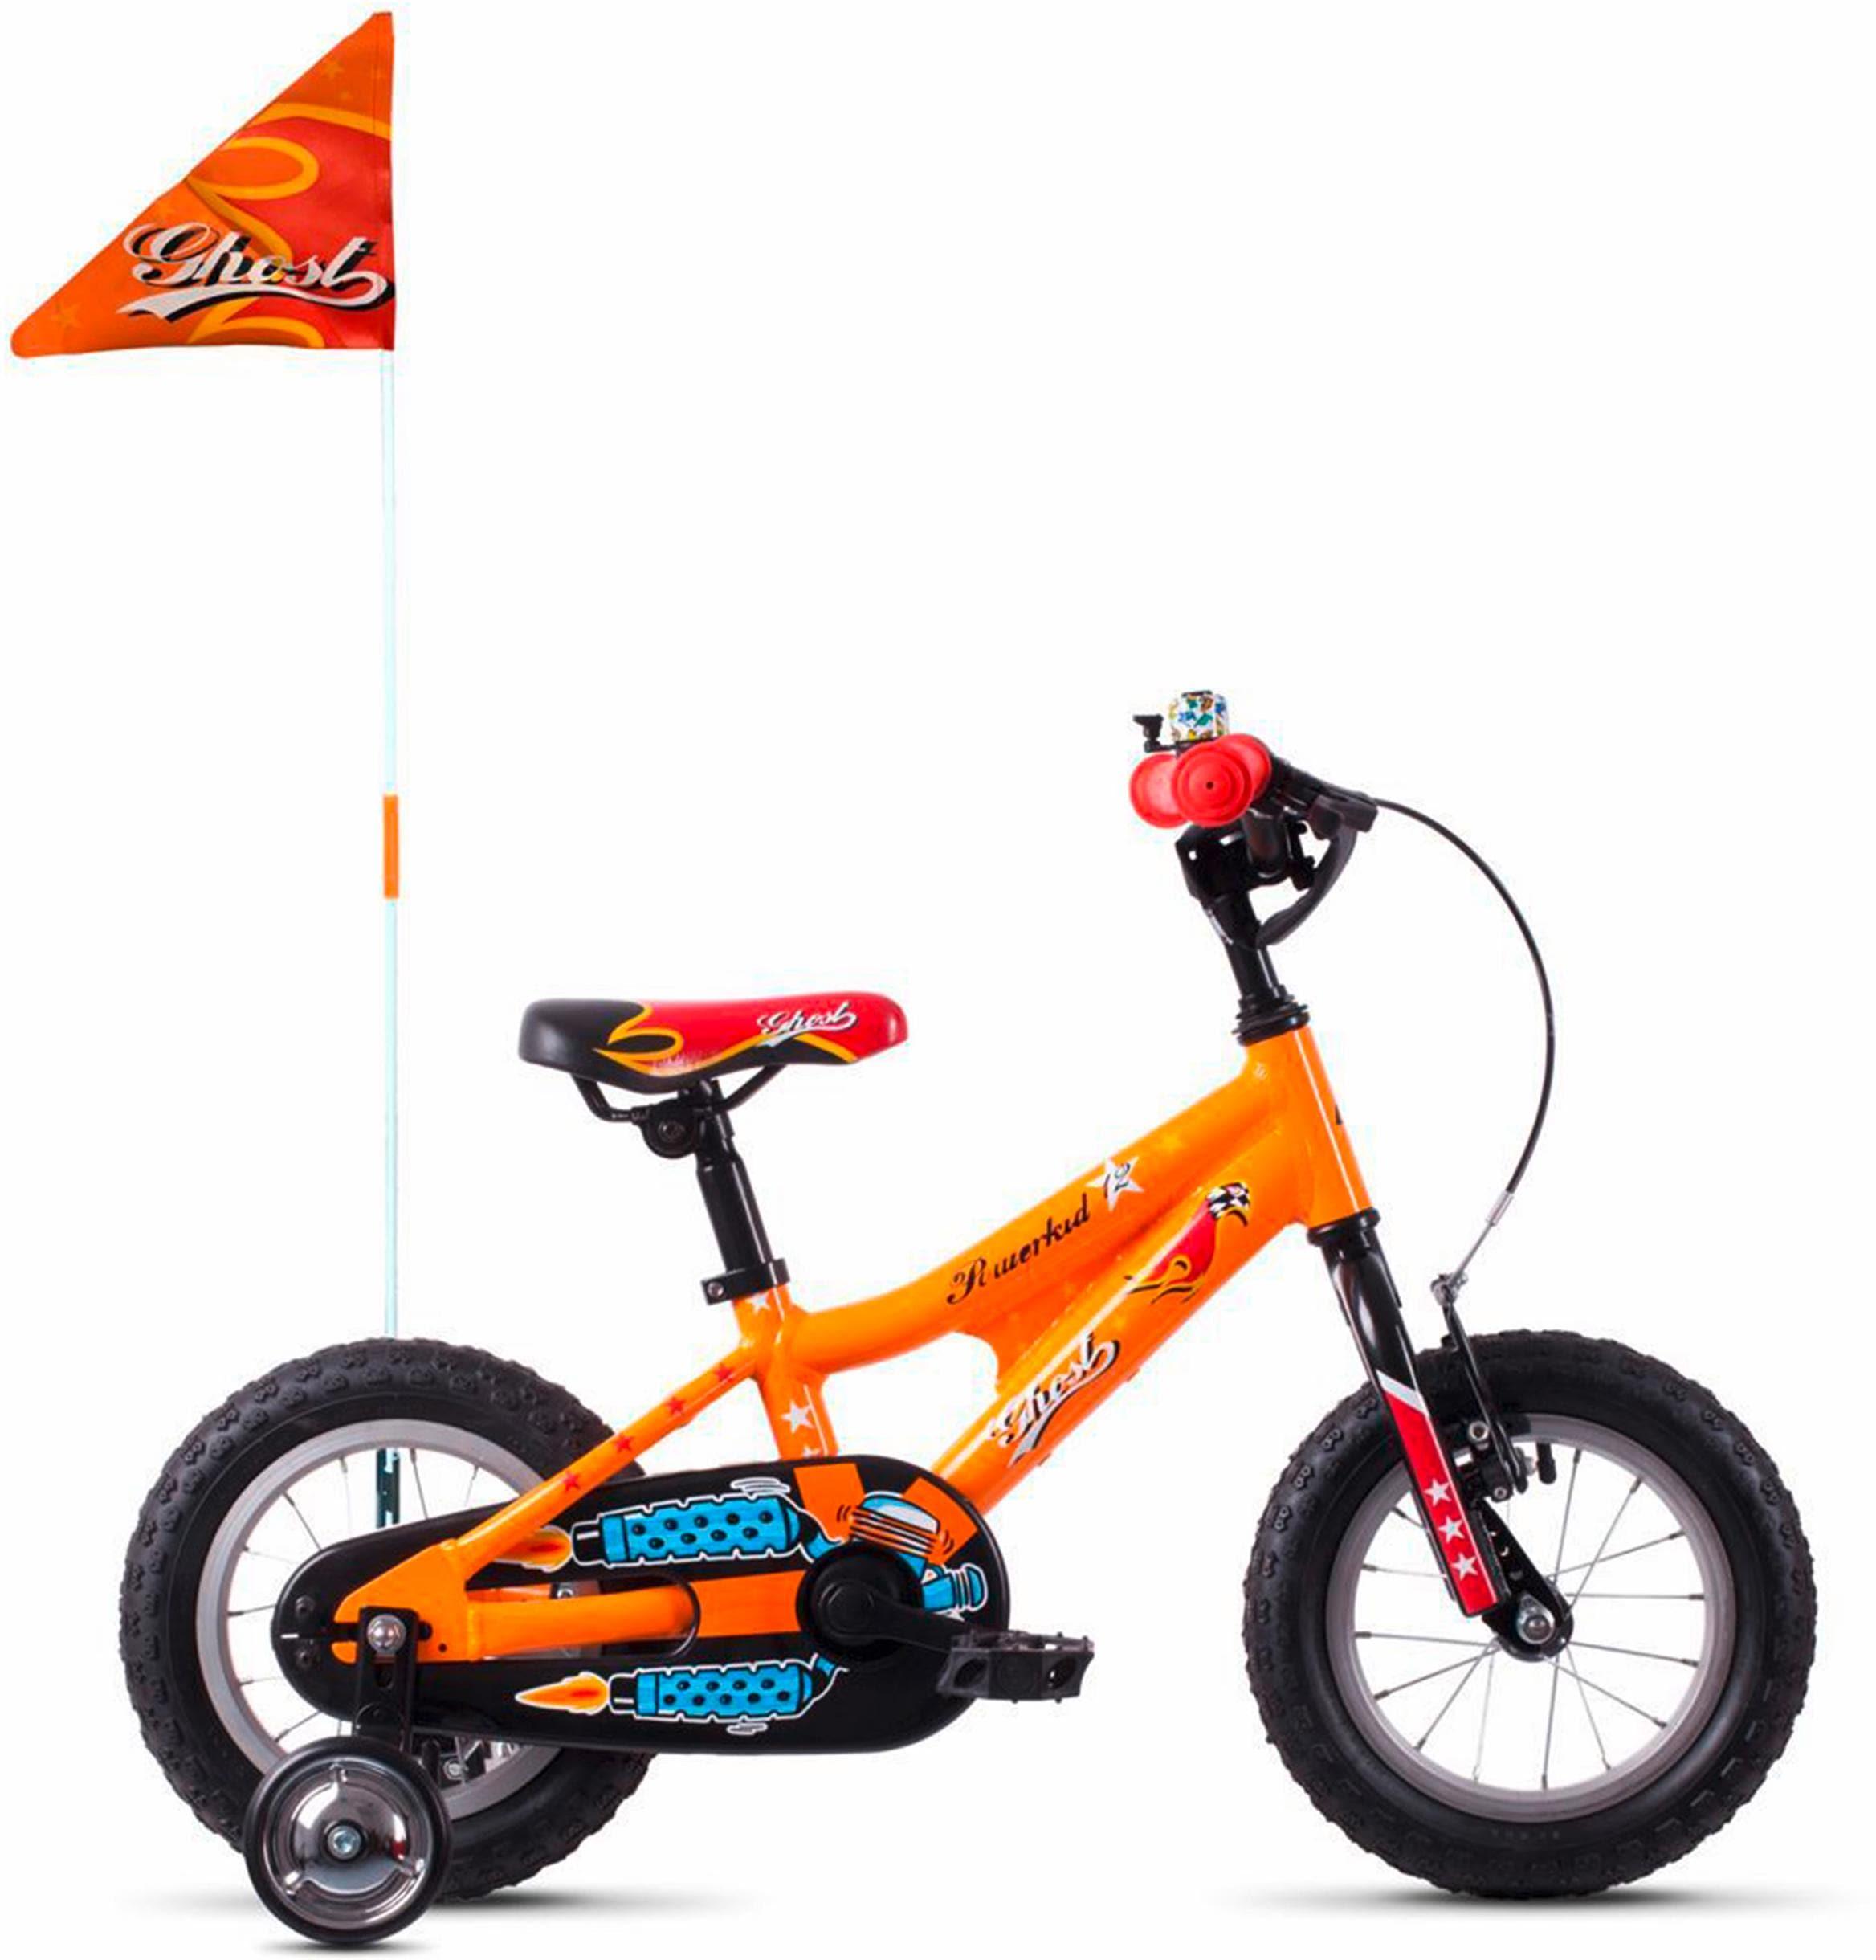 Ghost Kinderfahrrad POWERKID AL 12 K orange Kinder Kinderfahrräder Fahrräder Zubehör Fahrrad